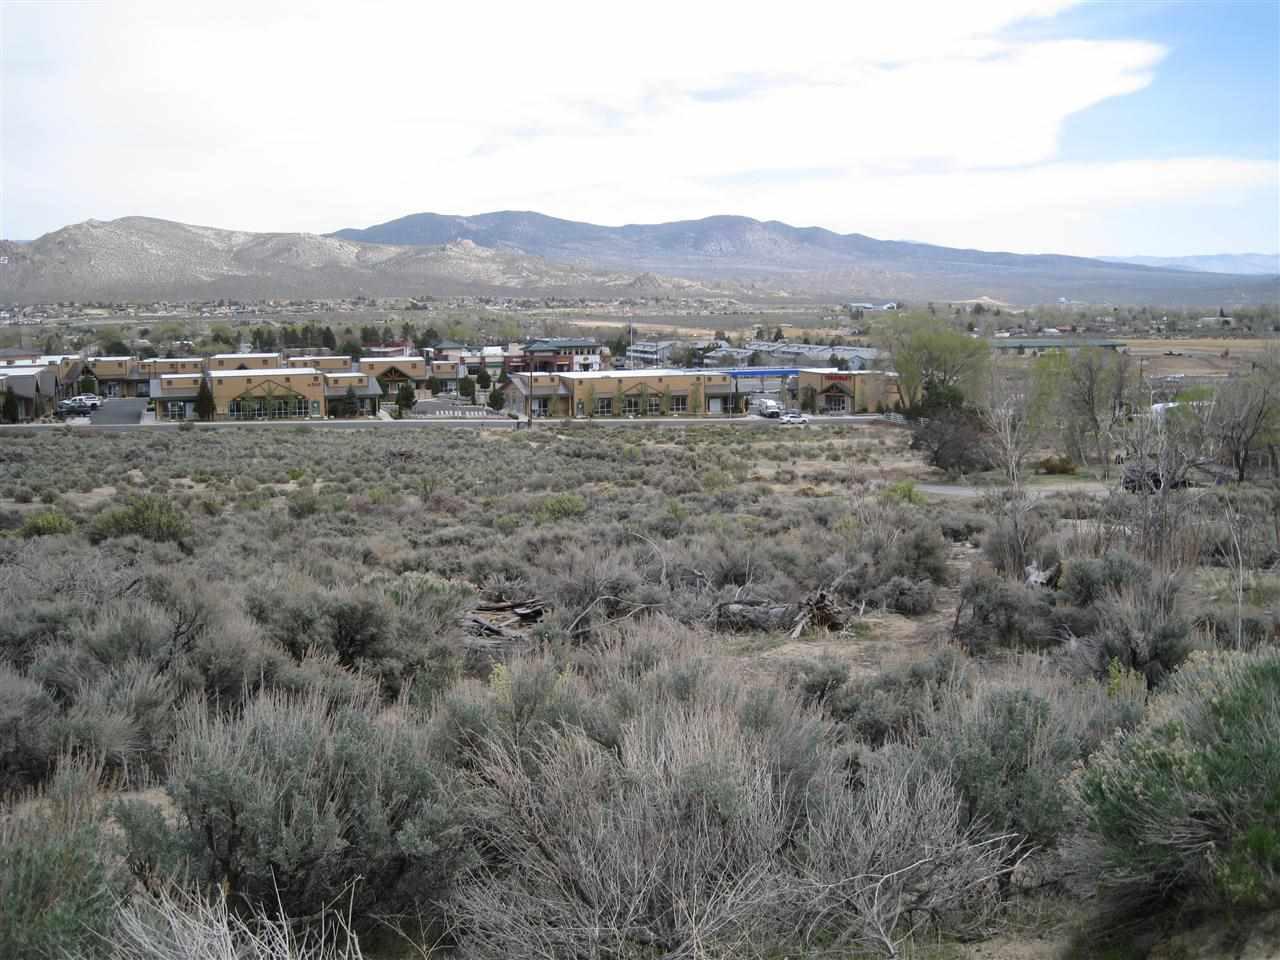 4630-468 Cochise, Carson City, NV 89701